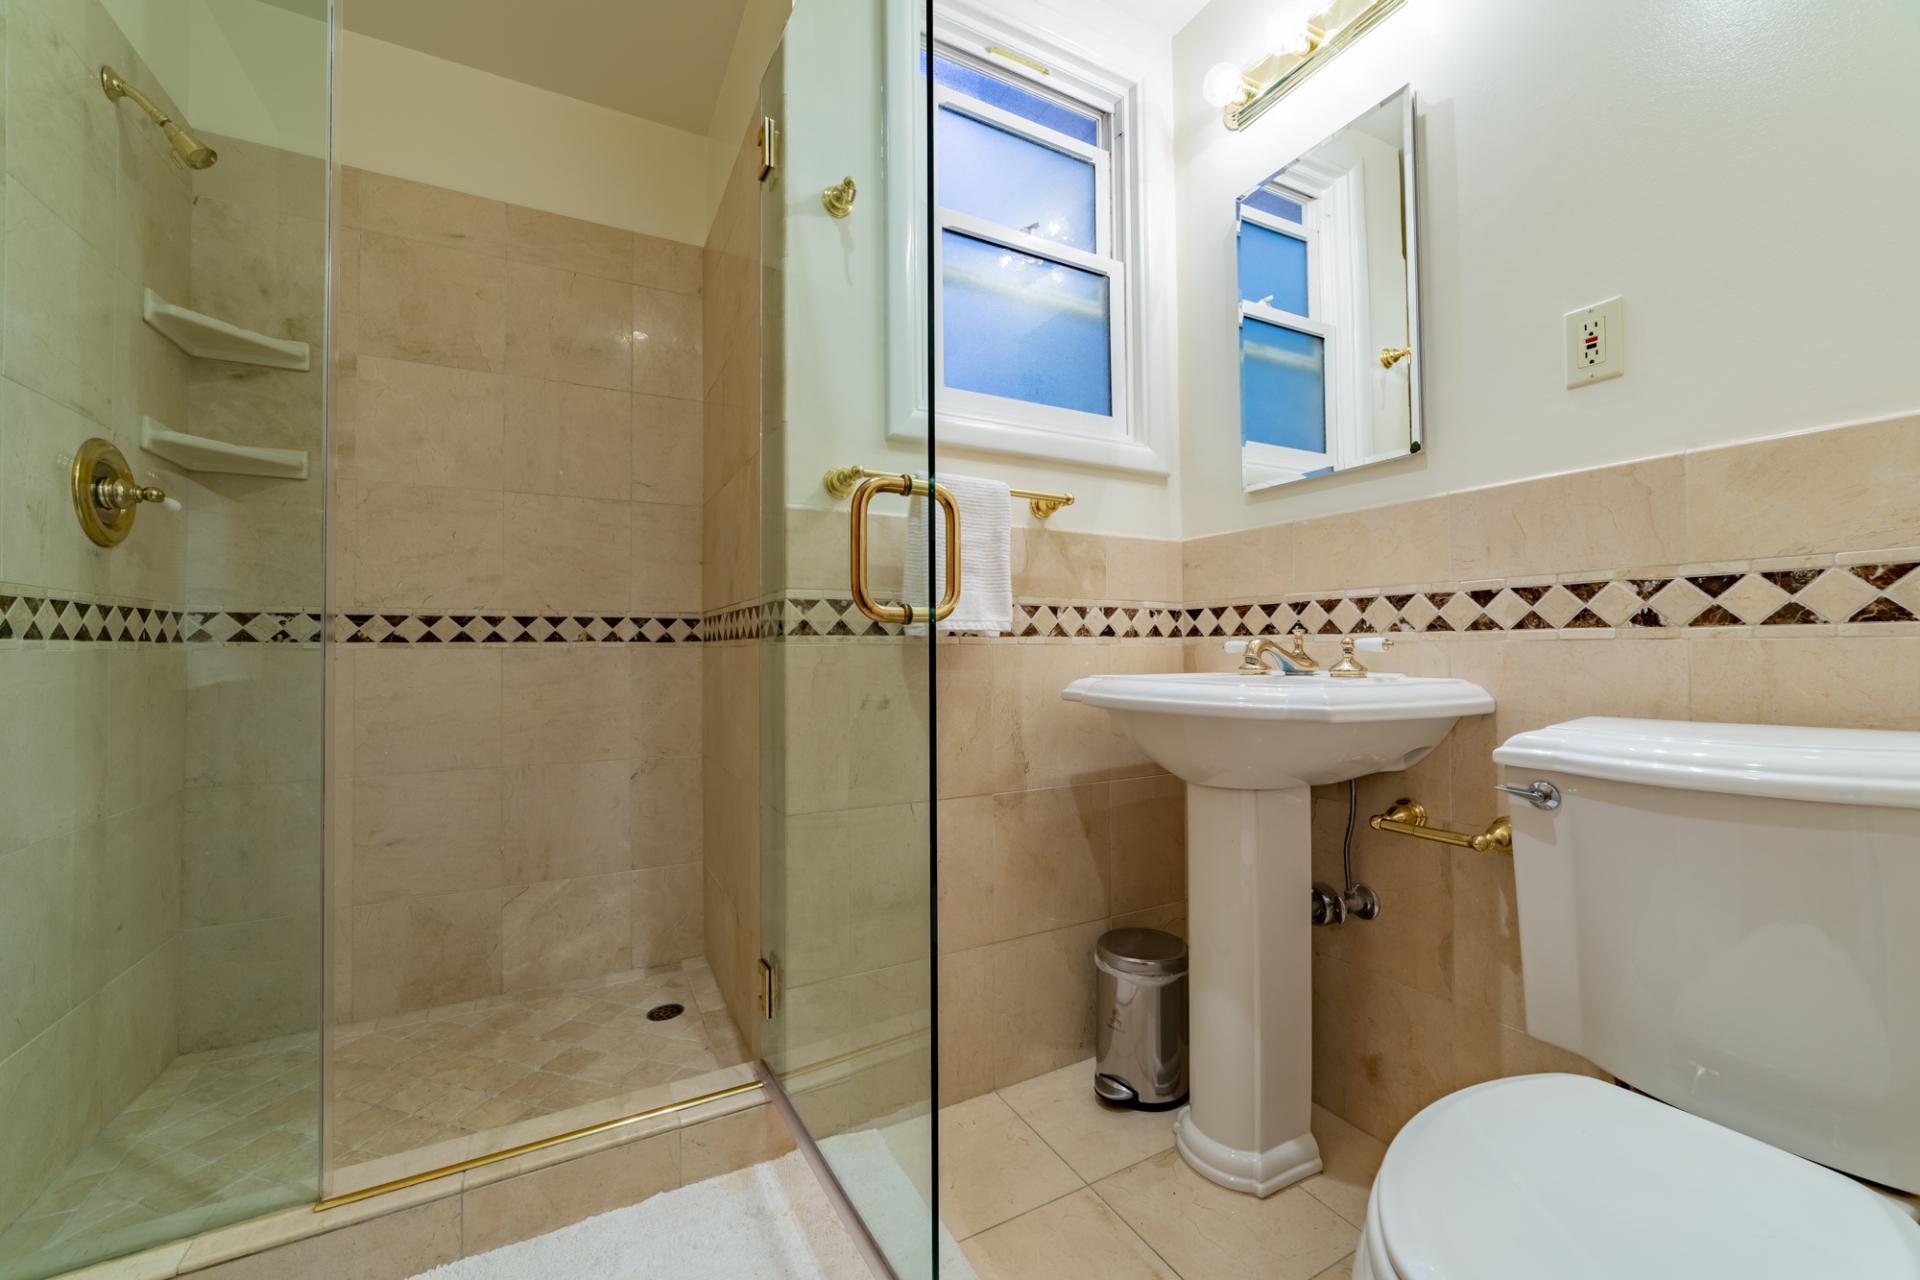 Bathroom at Leavenworth Street Apartment, Russian Hill, San Francisco